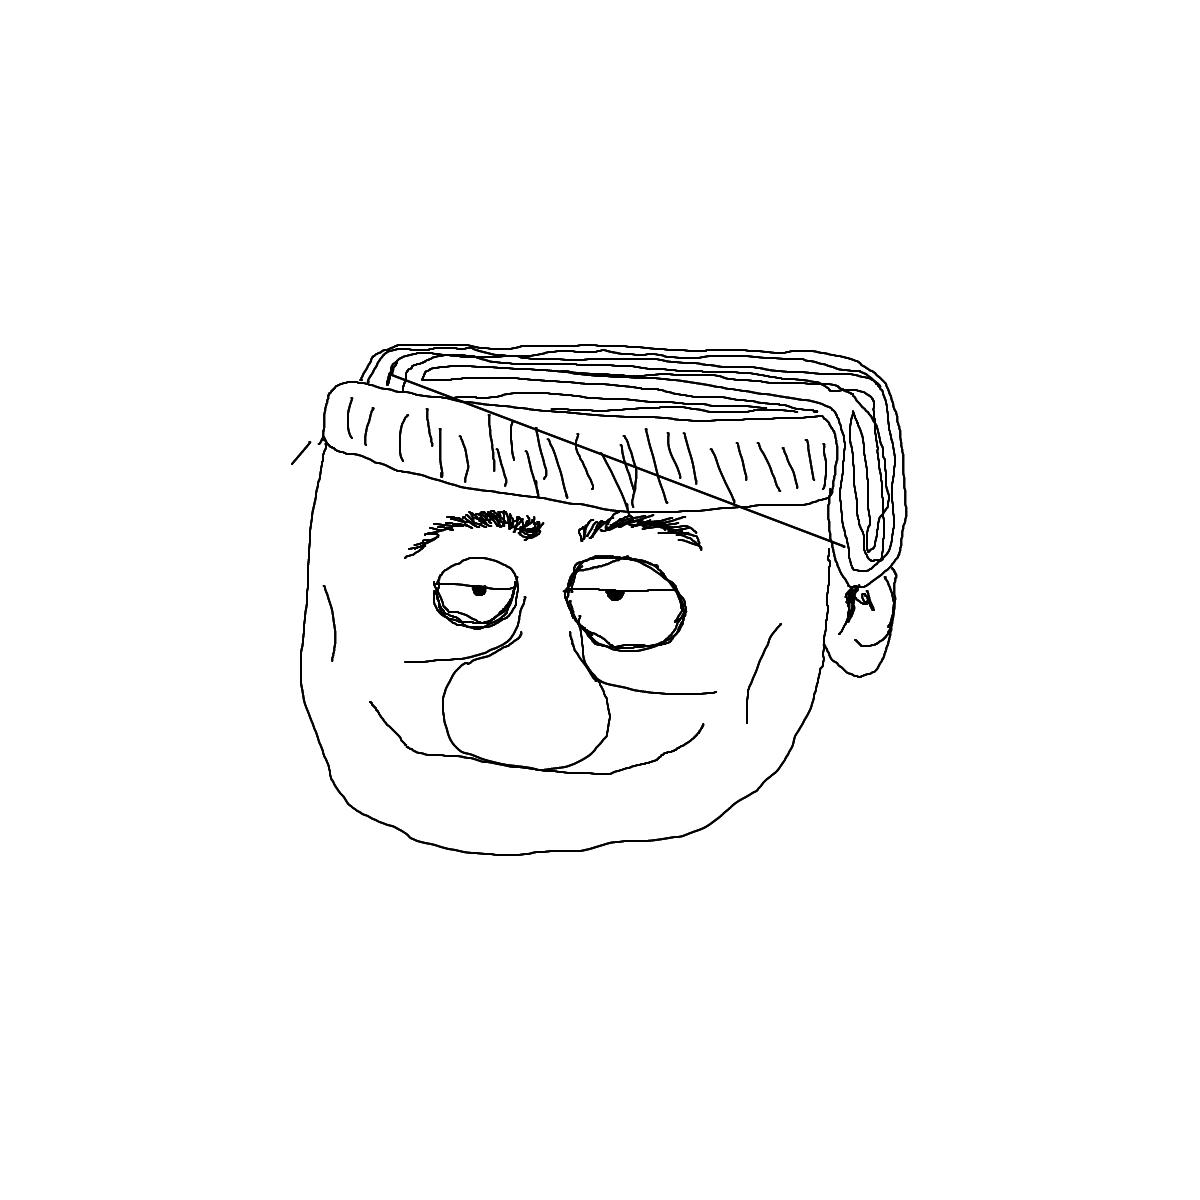 BAAAM drawing#23742 lat:44.9524497985839840lng: -93.0863952636718800